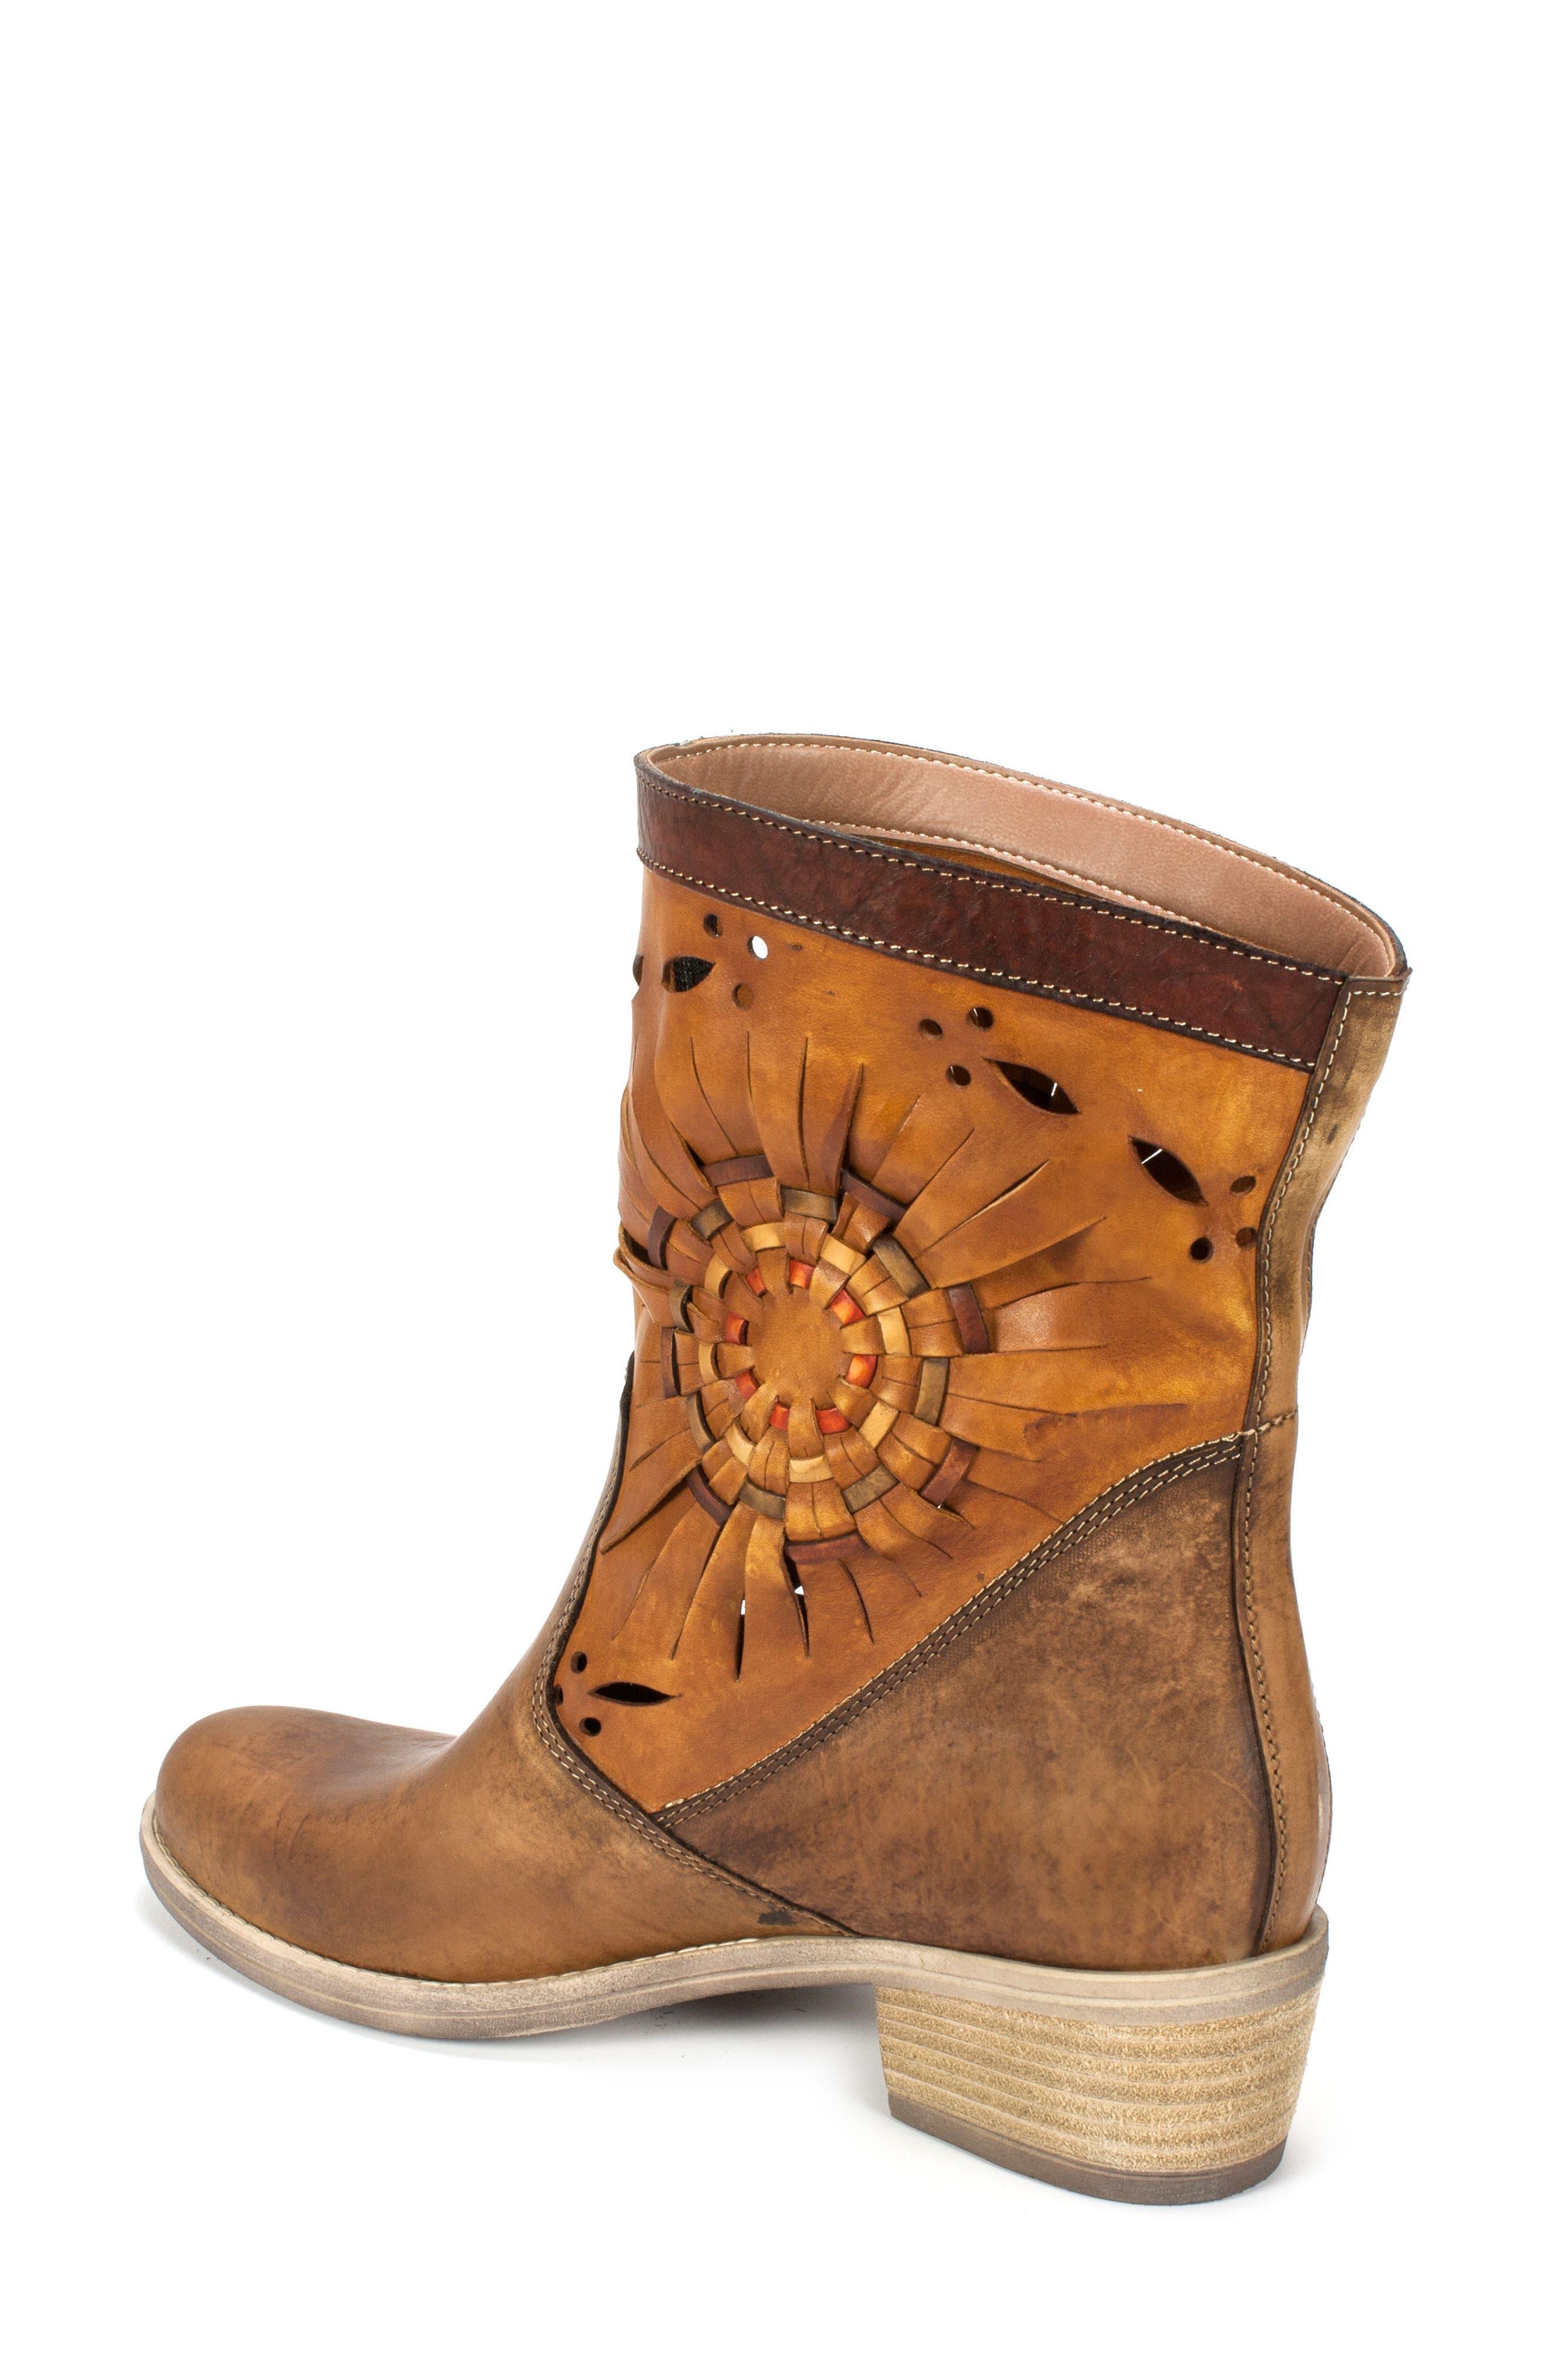 Taryn Woven Sunburst Boot,                             Alternate thumbnail 2, color,                             200